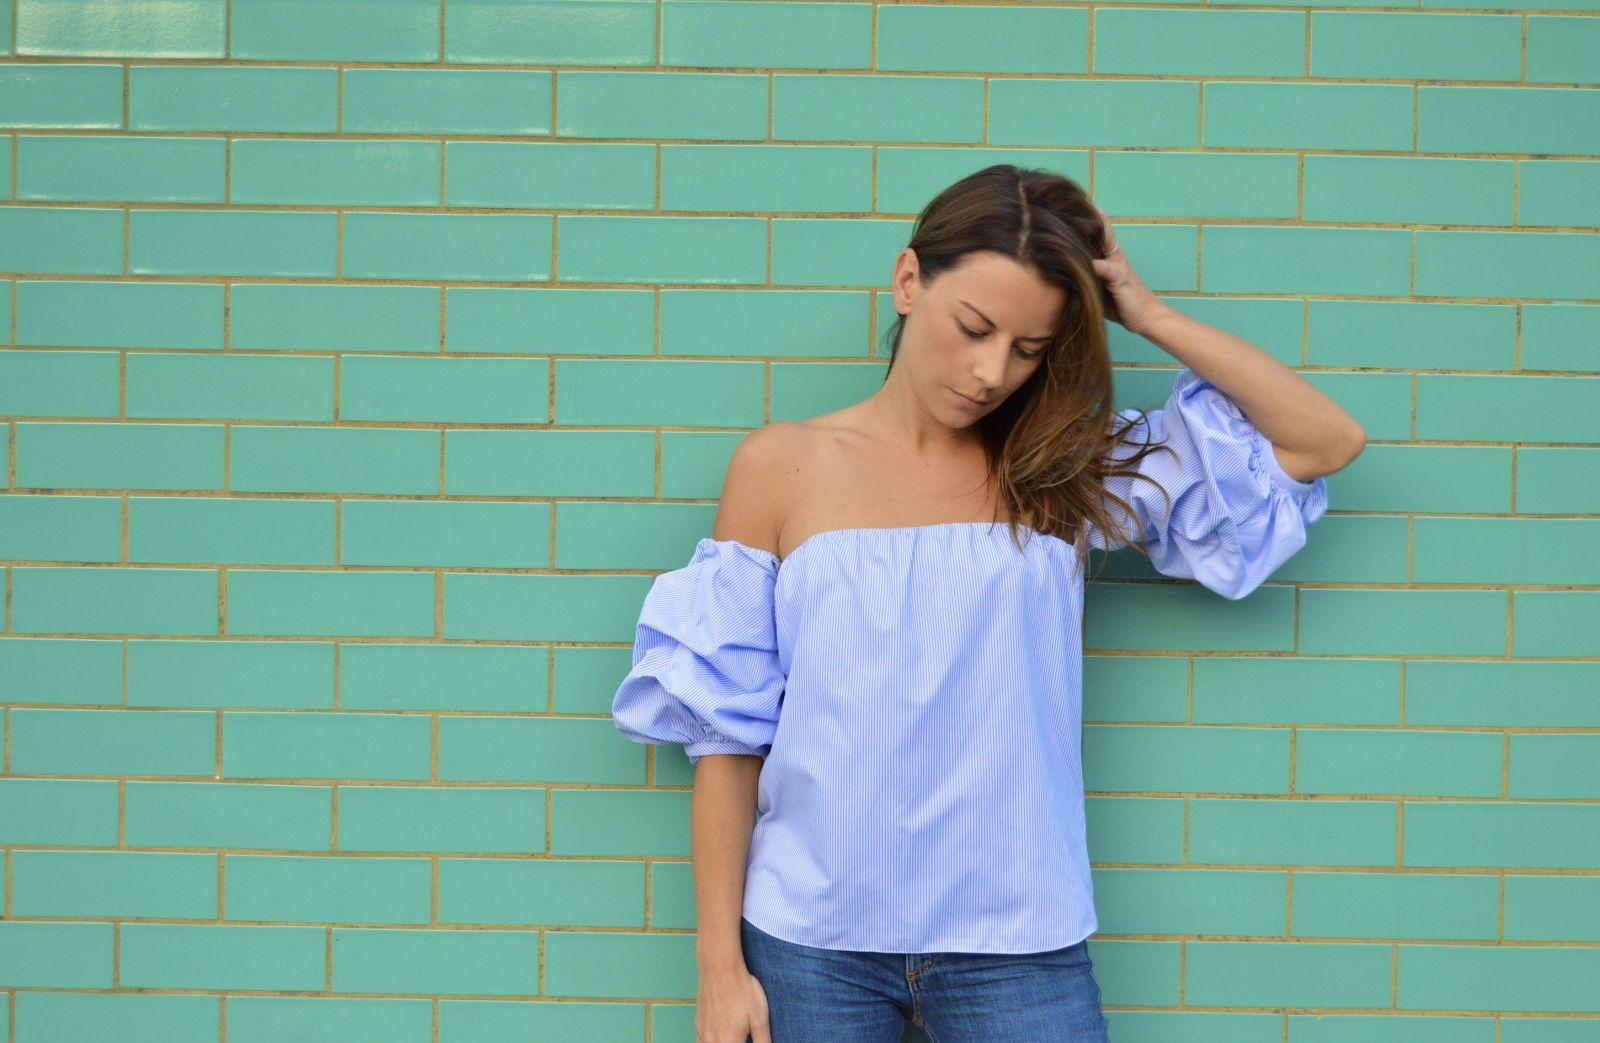 johanna ortiz, rag & bone jean, juliet angus, ladies of london, london blogger, fashion blogger,